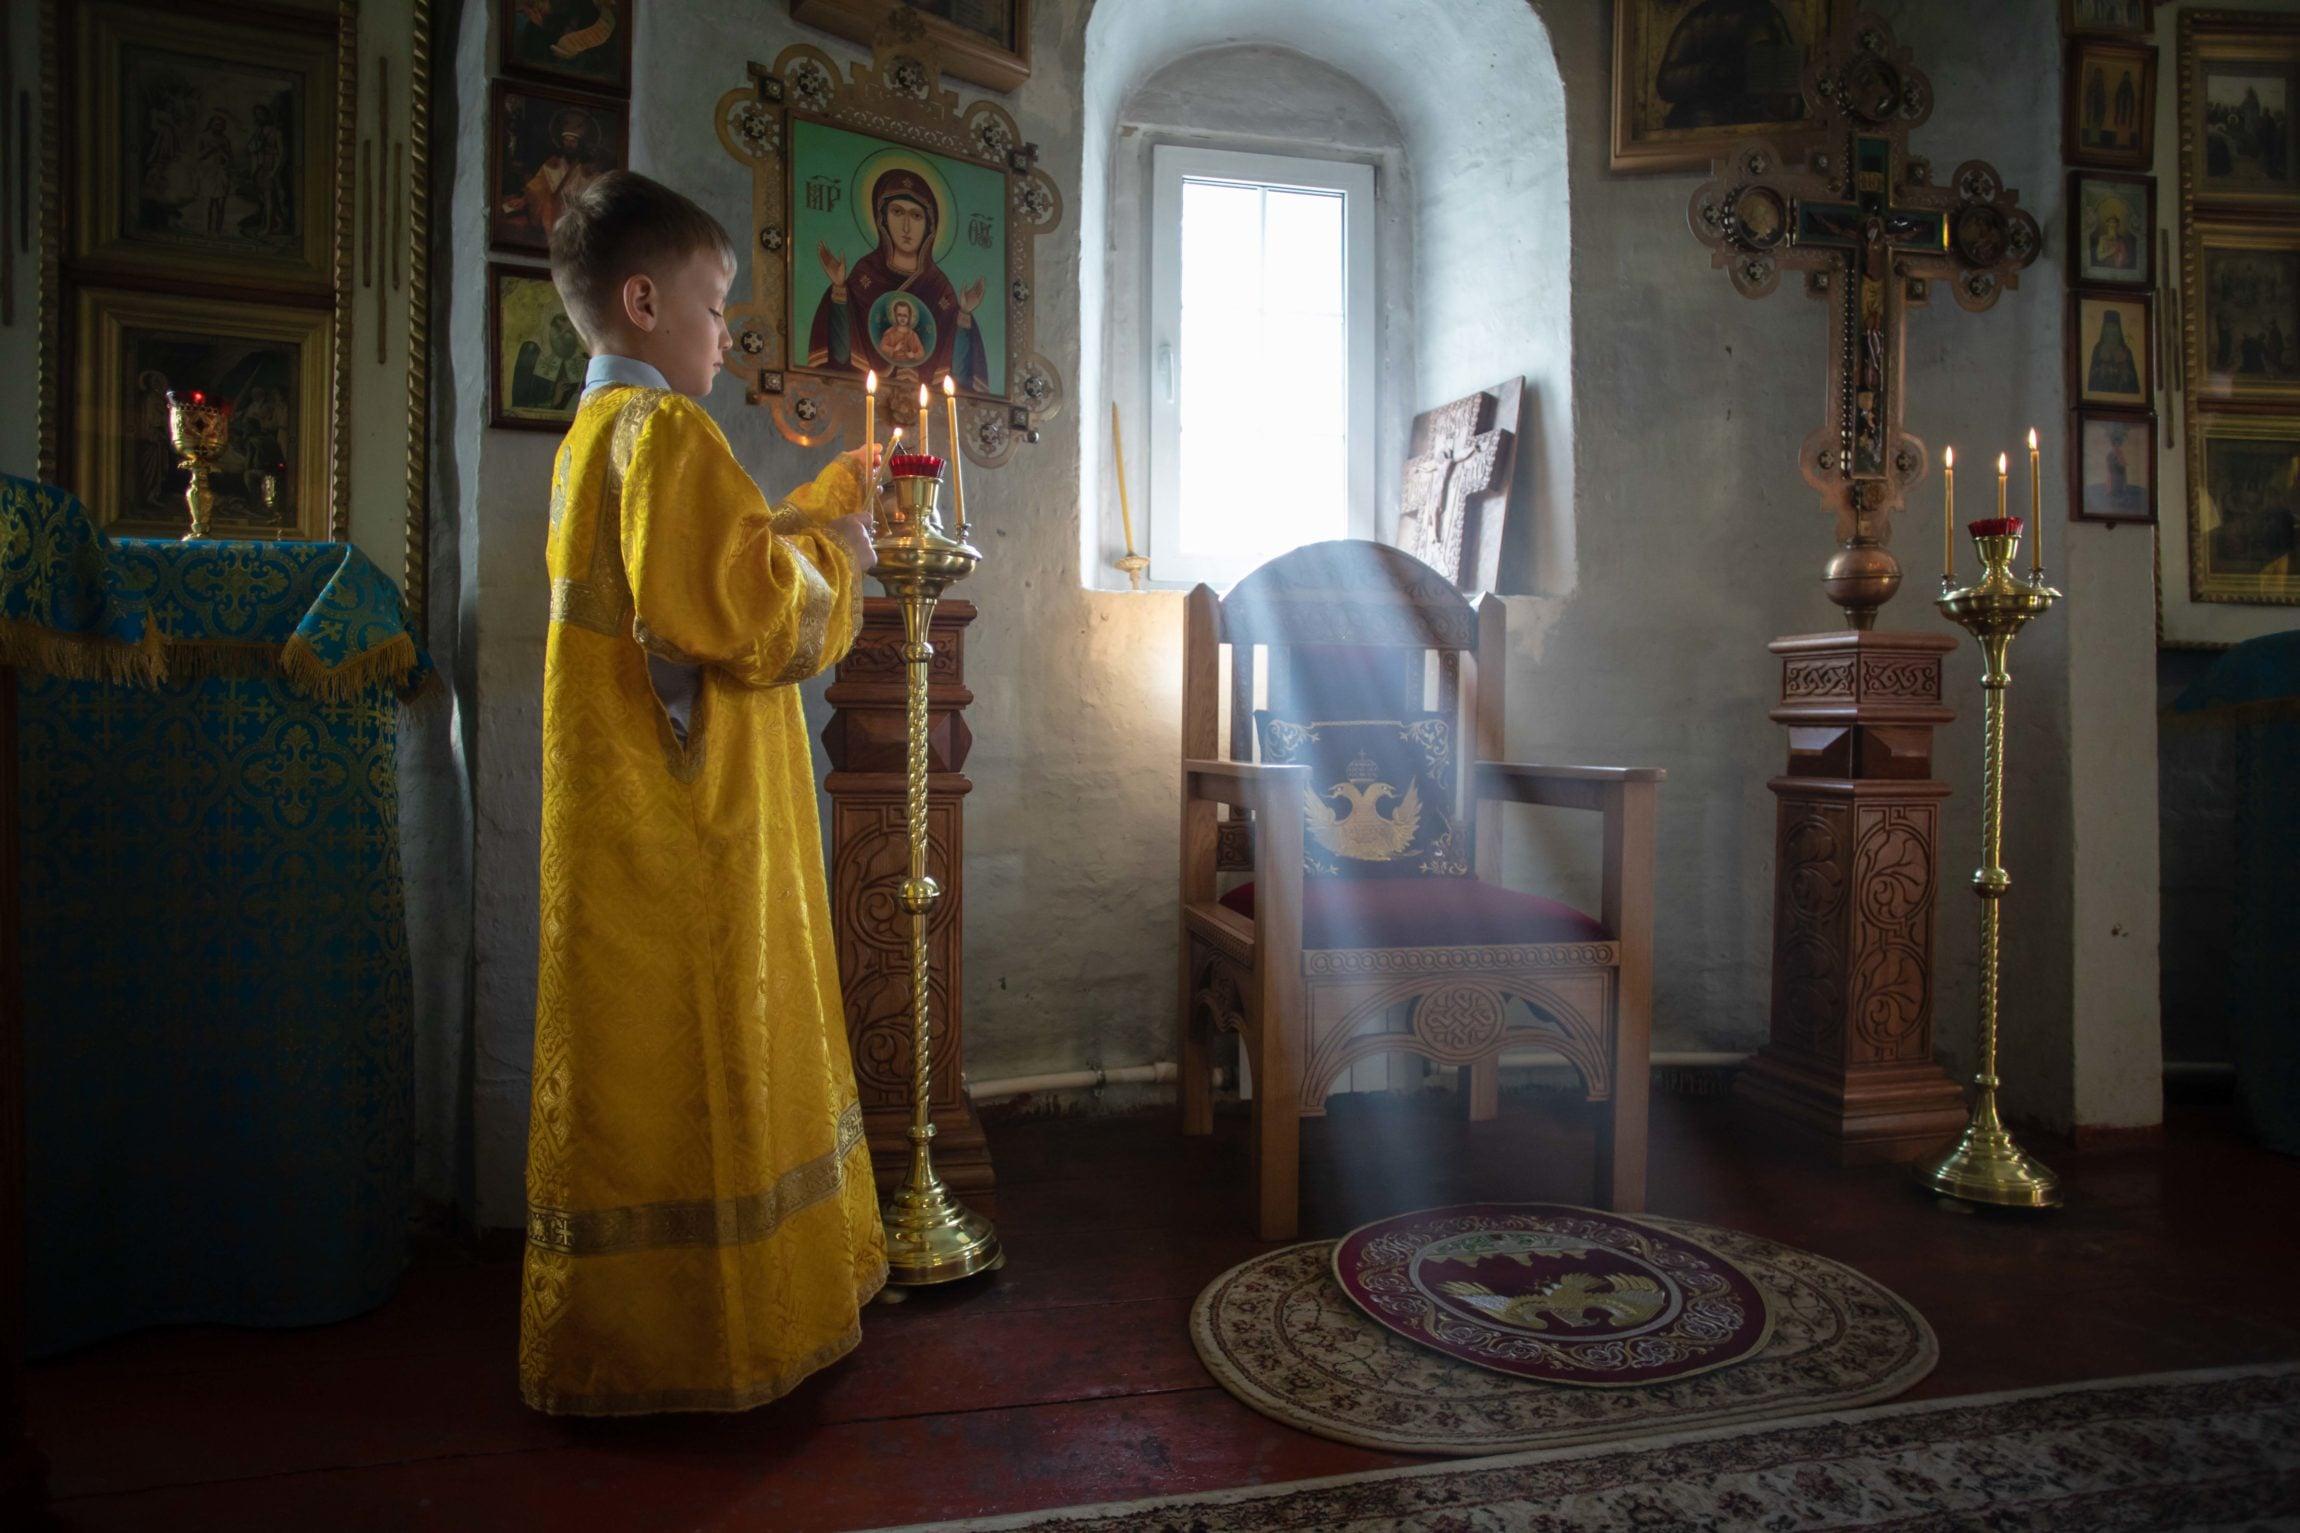 http://monuspen.ru/photoreports/143c0879173e3e11c82dee859362f224.jpg